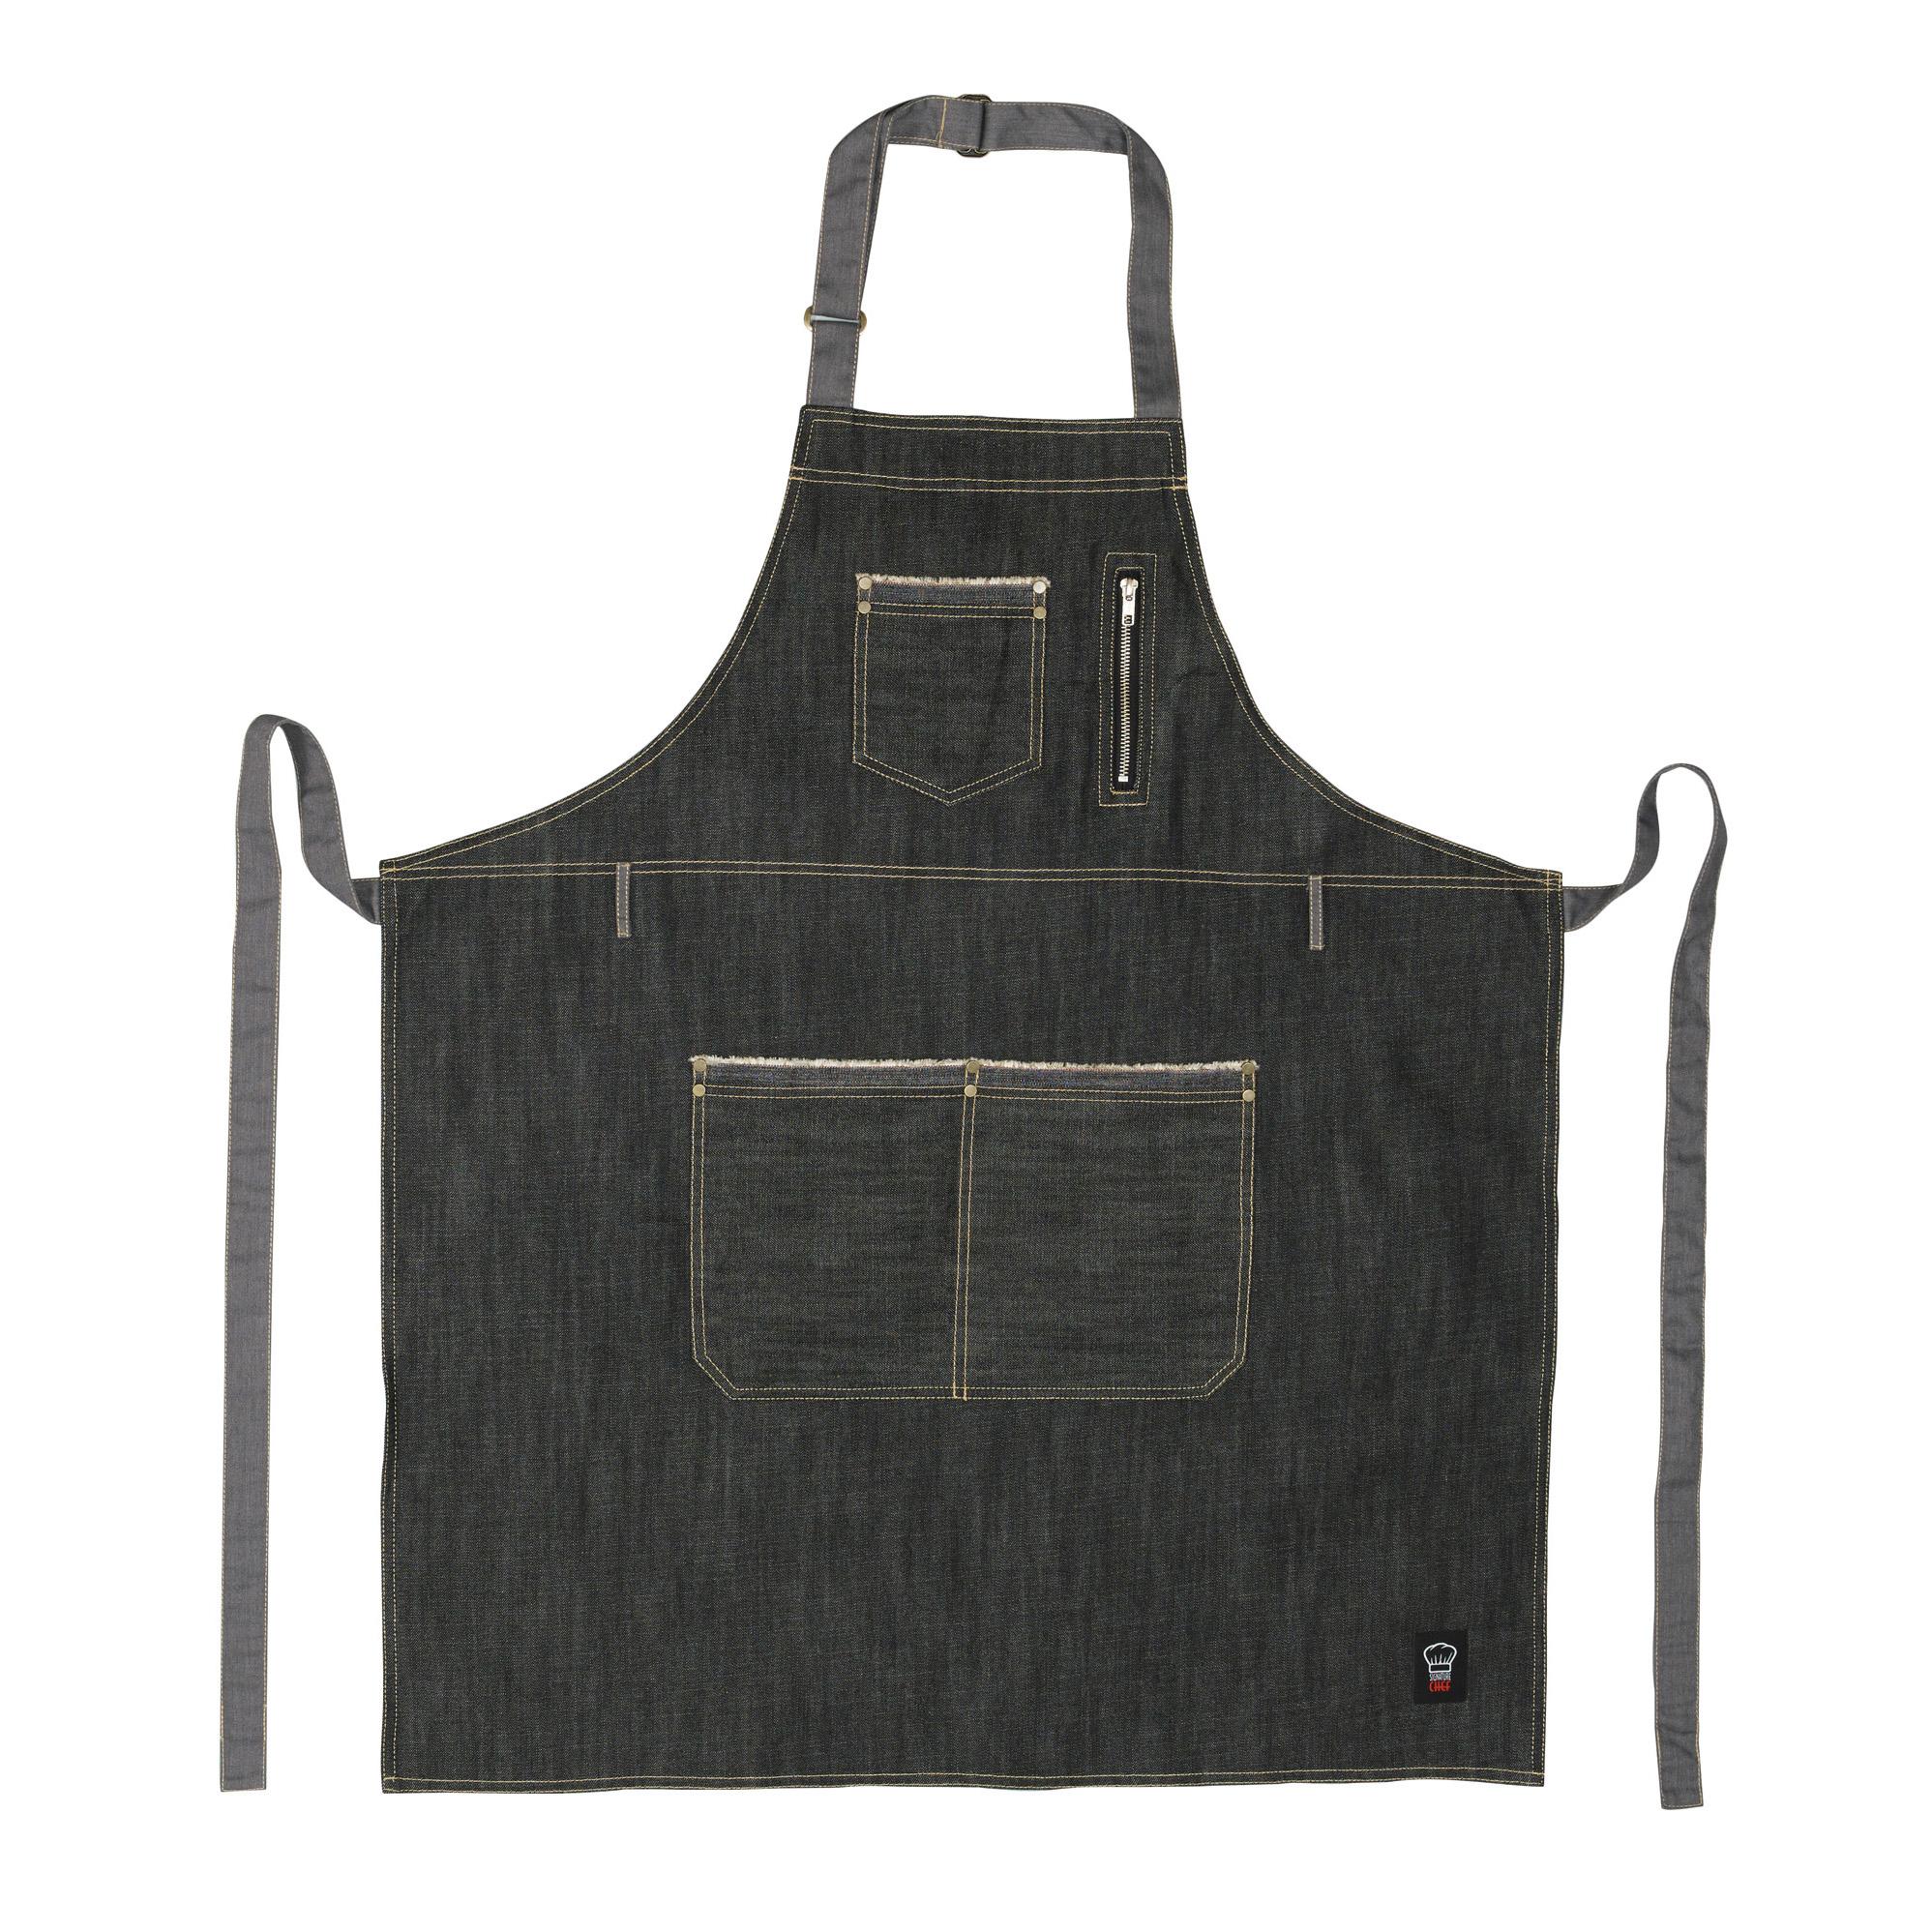 Winco BADN-3430 bib apron